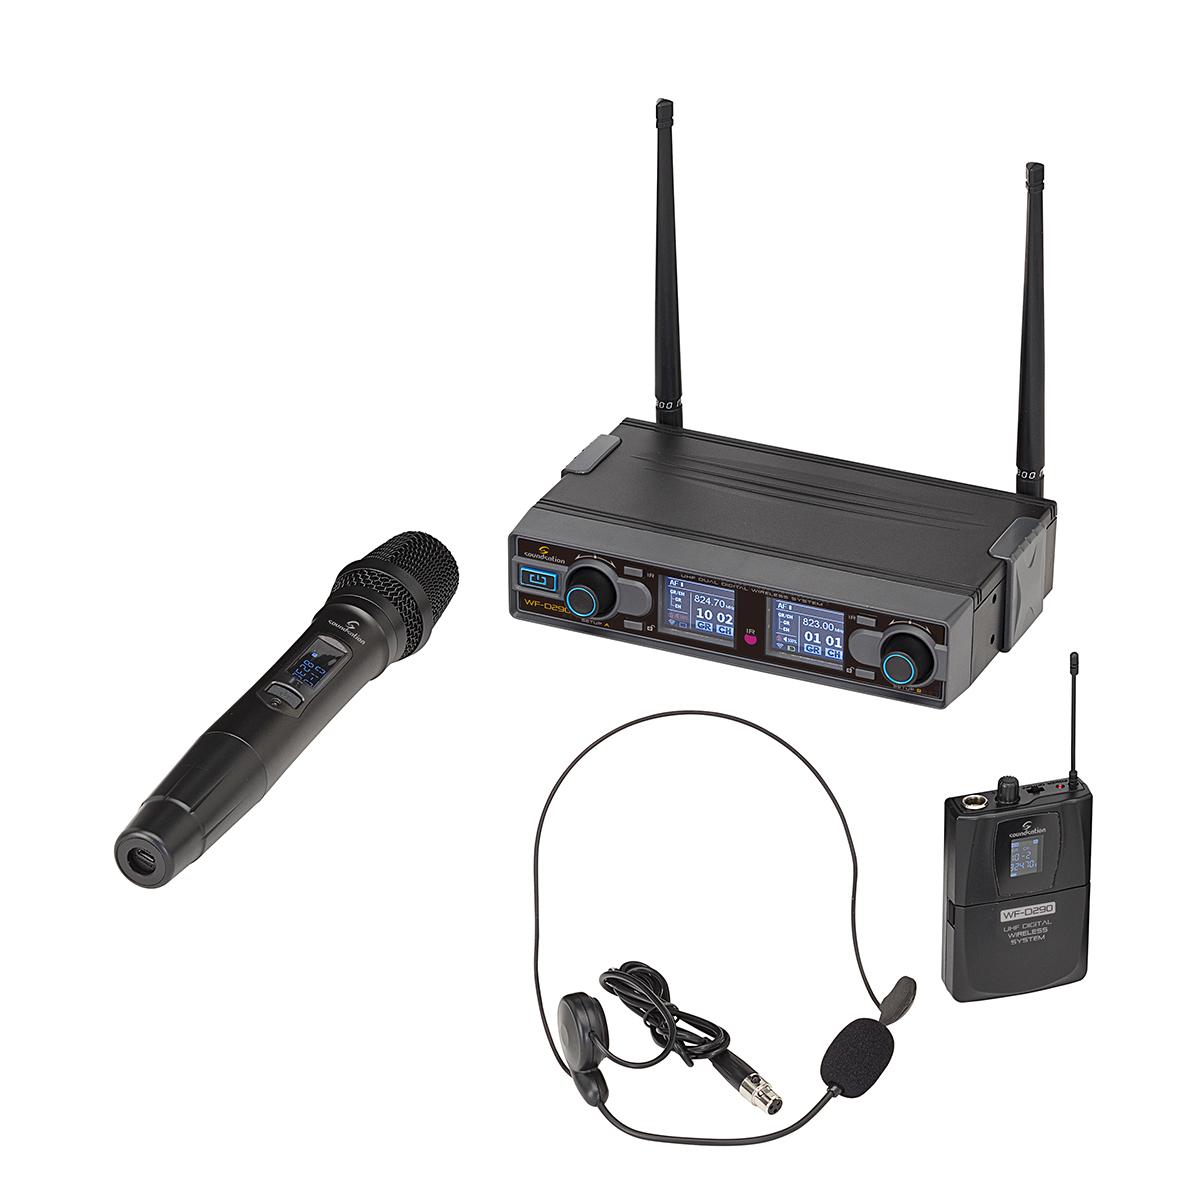 RADIOMIC. DIGITALE DOPPIO UHF SOUNDSATION WF-D290HP 1TX MANO + 1TASC.&HEADSET 823-832MHz